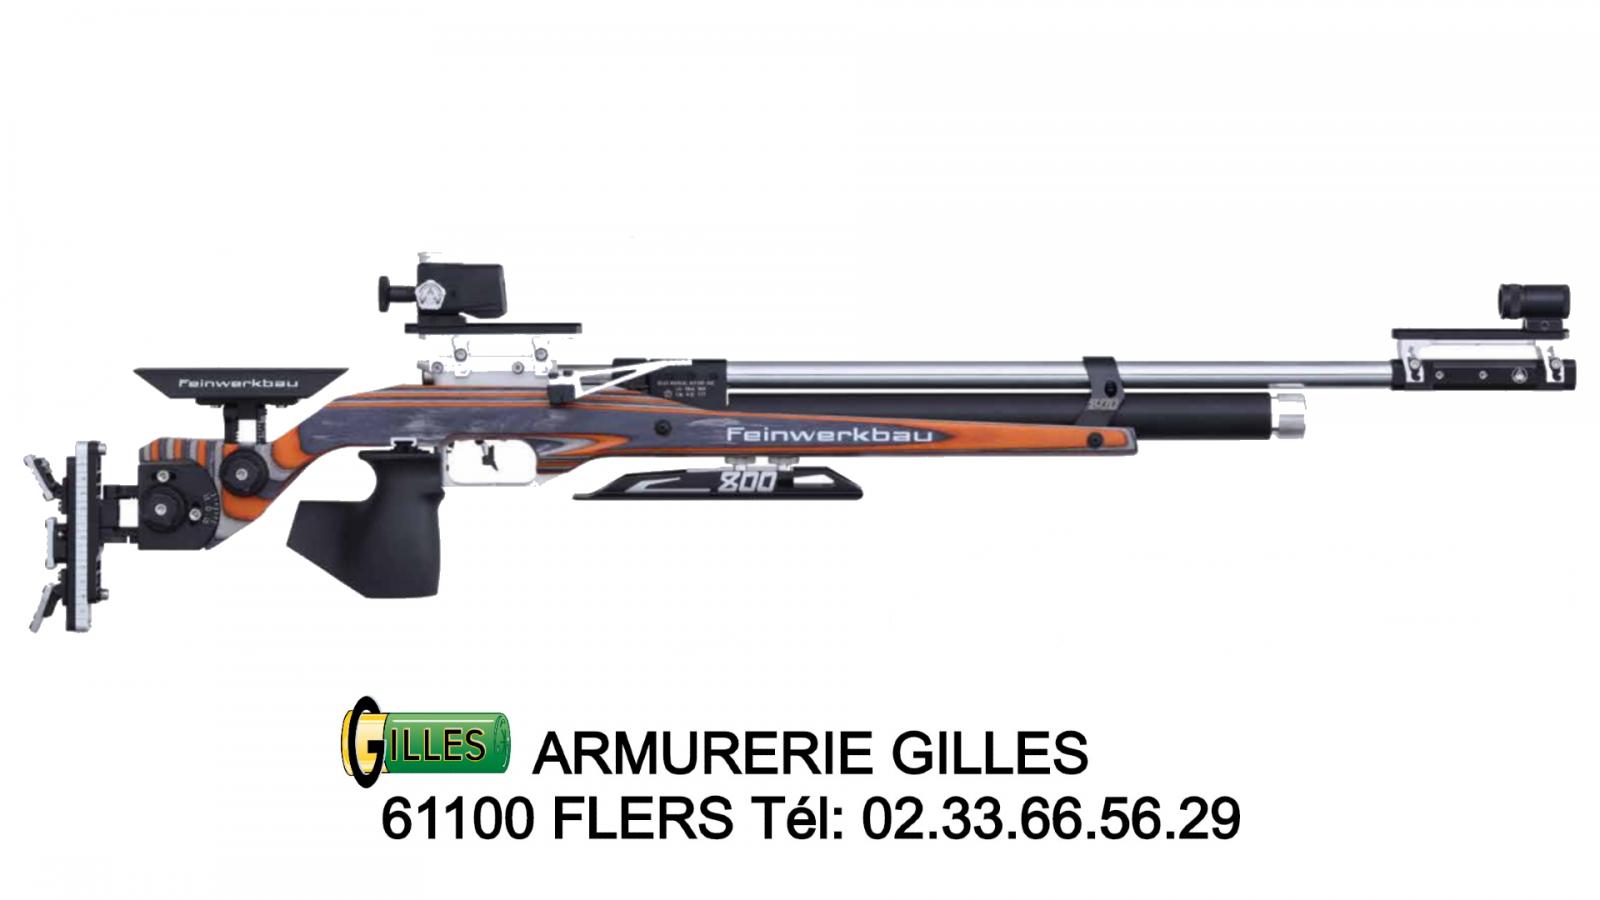 Carabine FEINWERKBAU 800 Orange à air Ambidextre